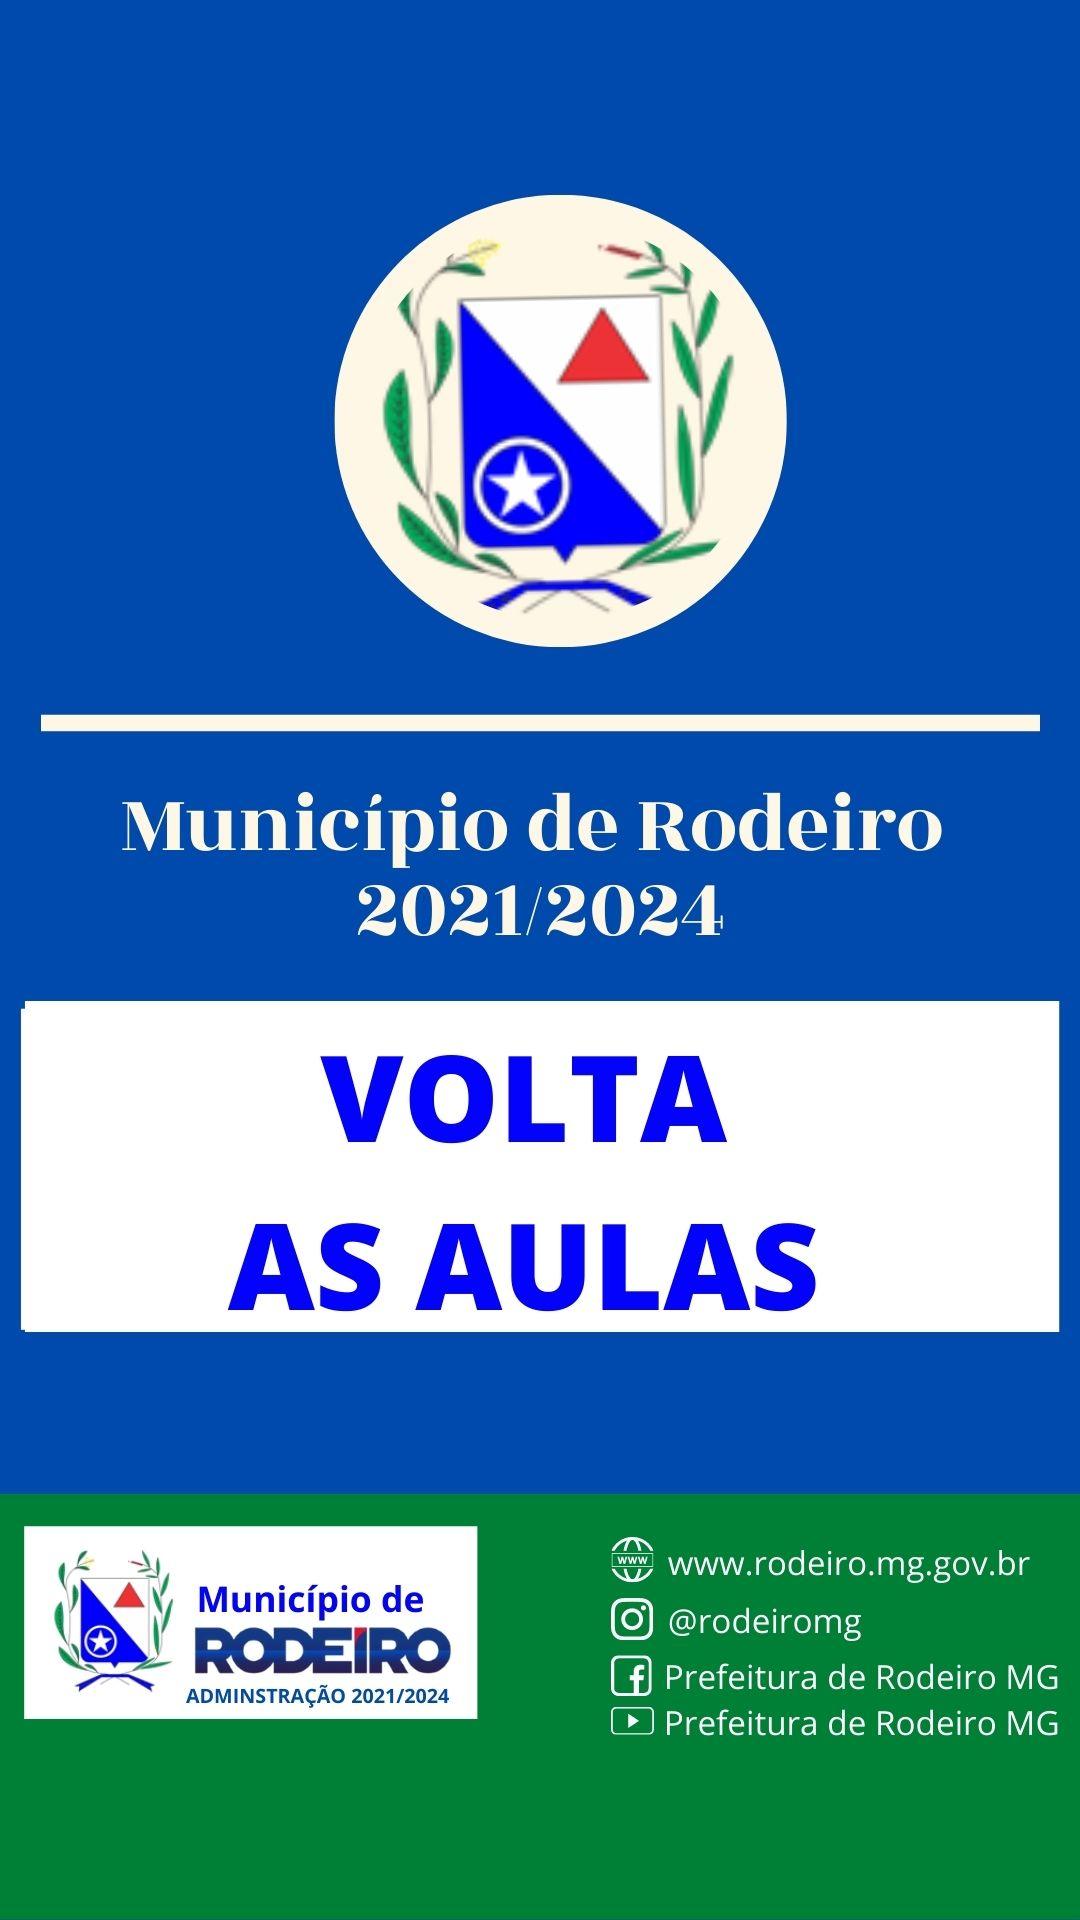 VOLTA ÀS AULAS - RODEIRO